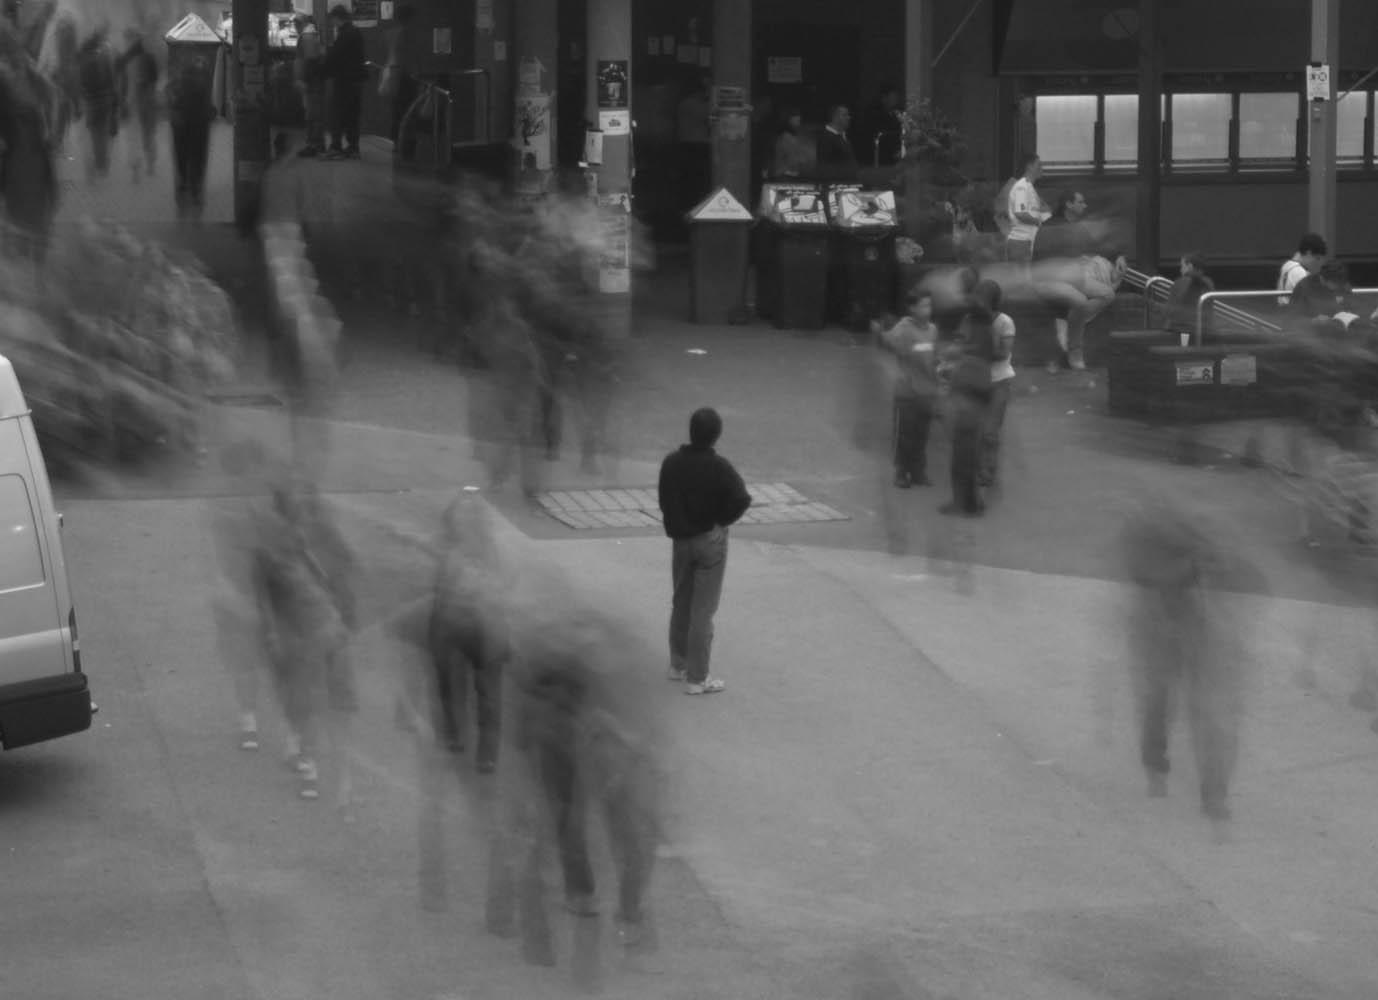 Одиночество человека6